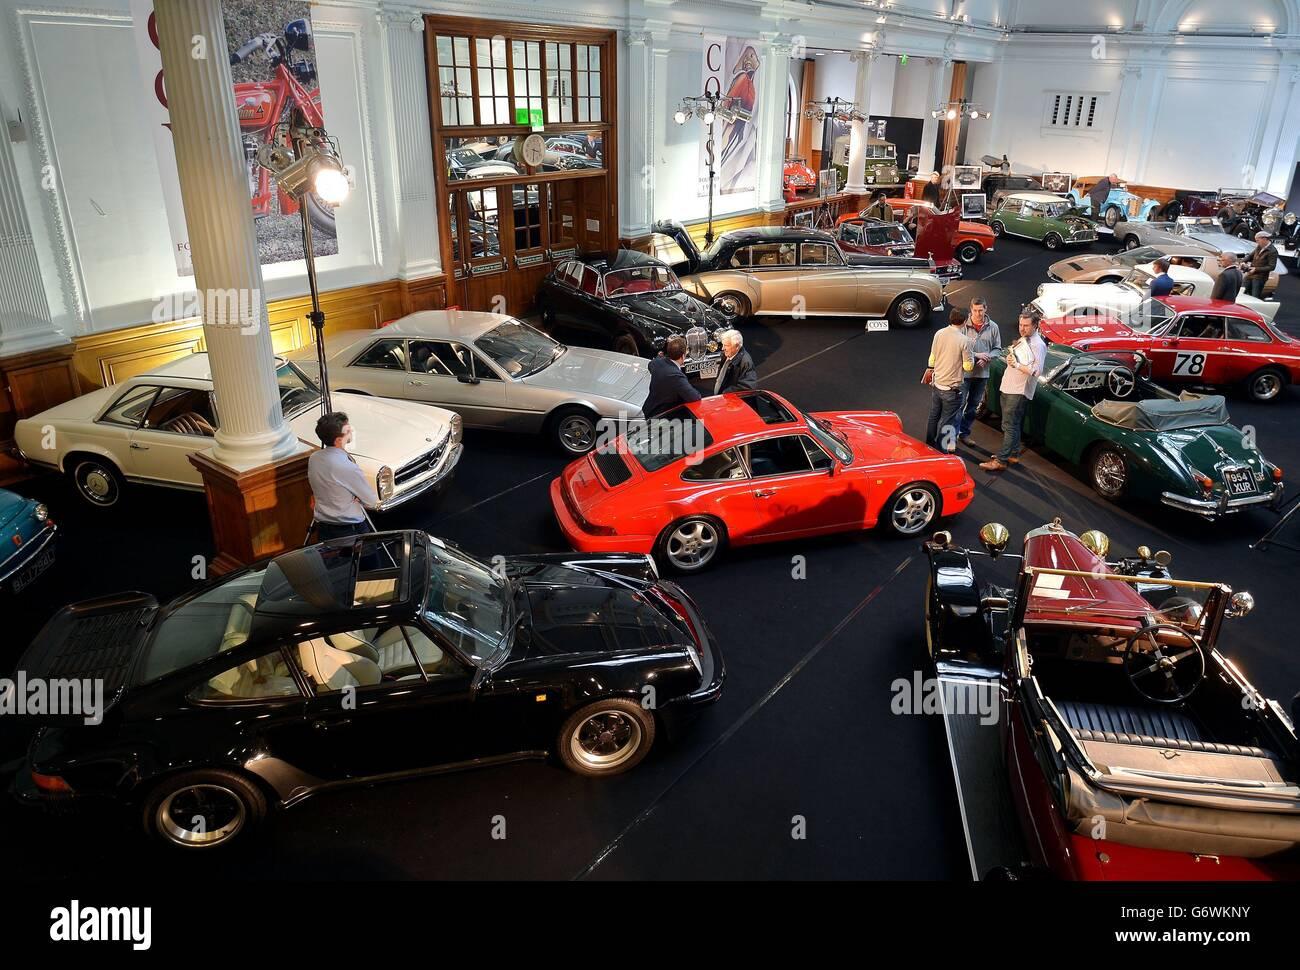 Vintage cars auction Stock Photo: 107514455 - Alamy